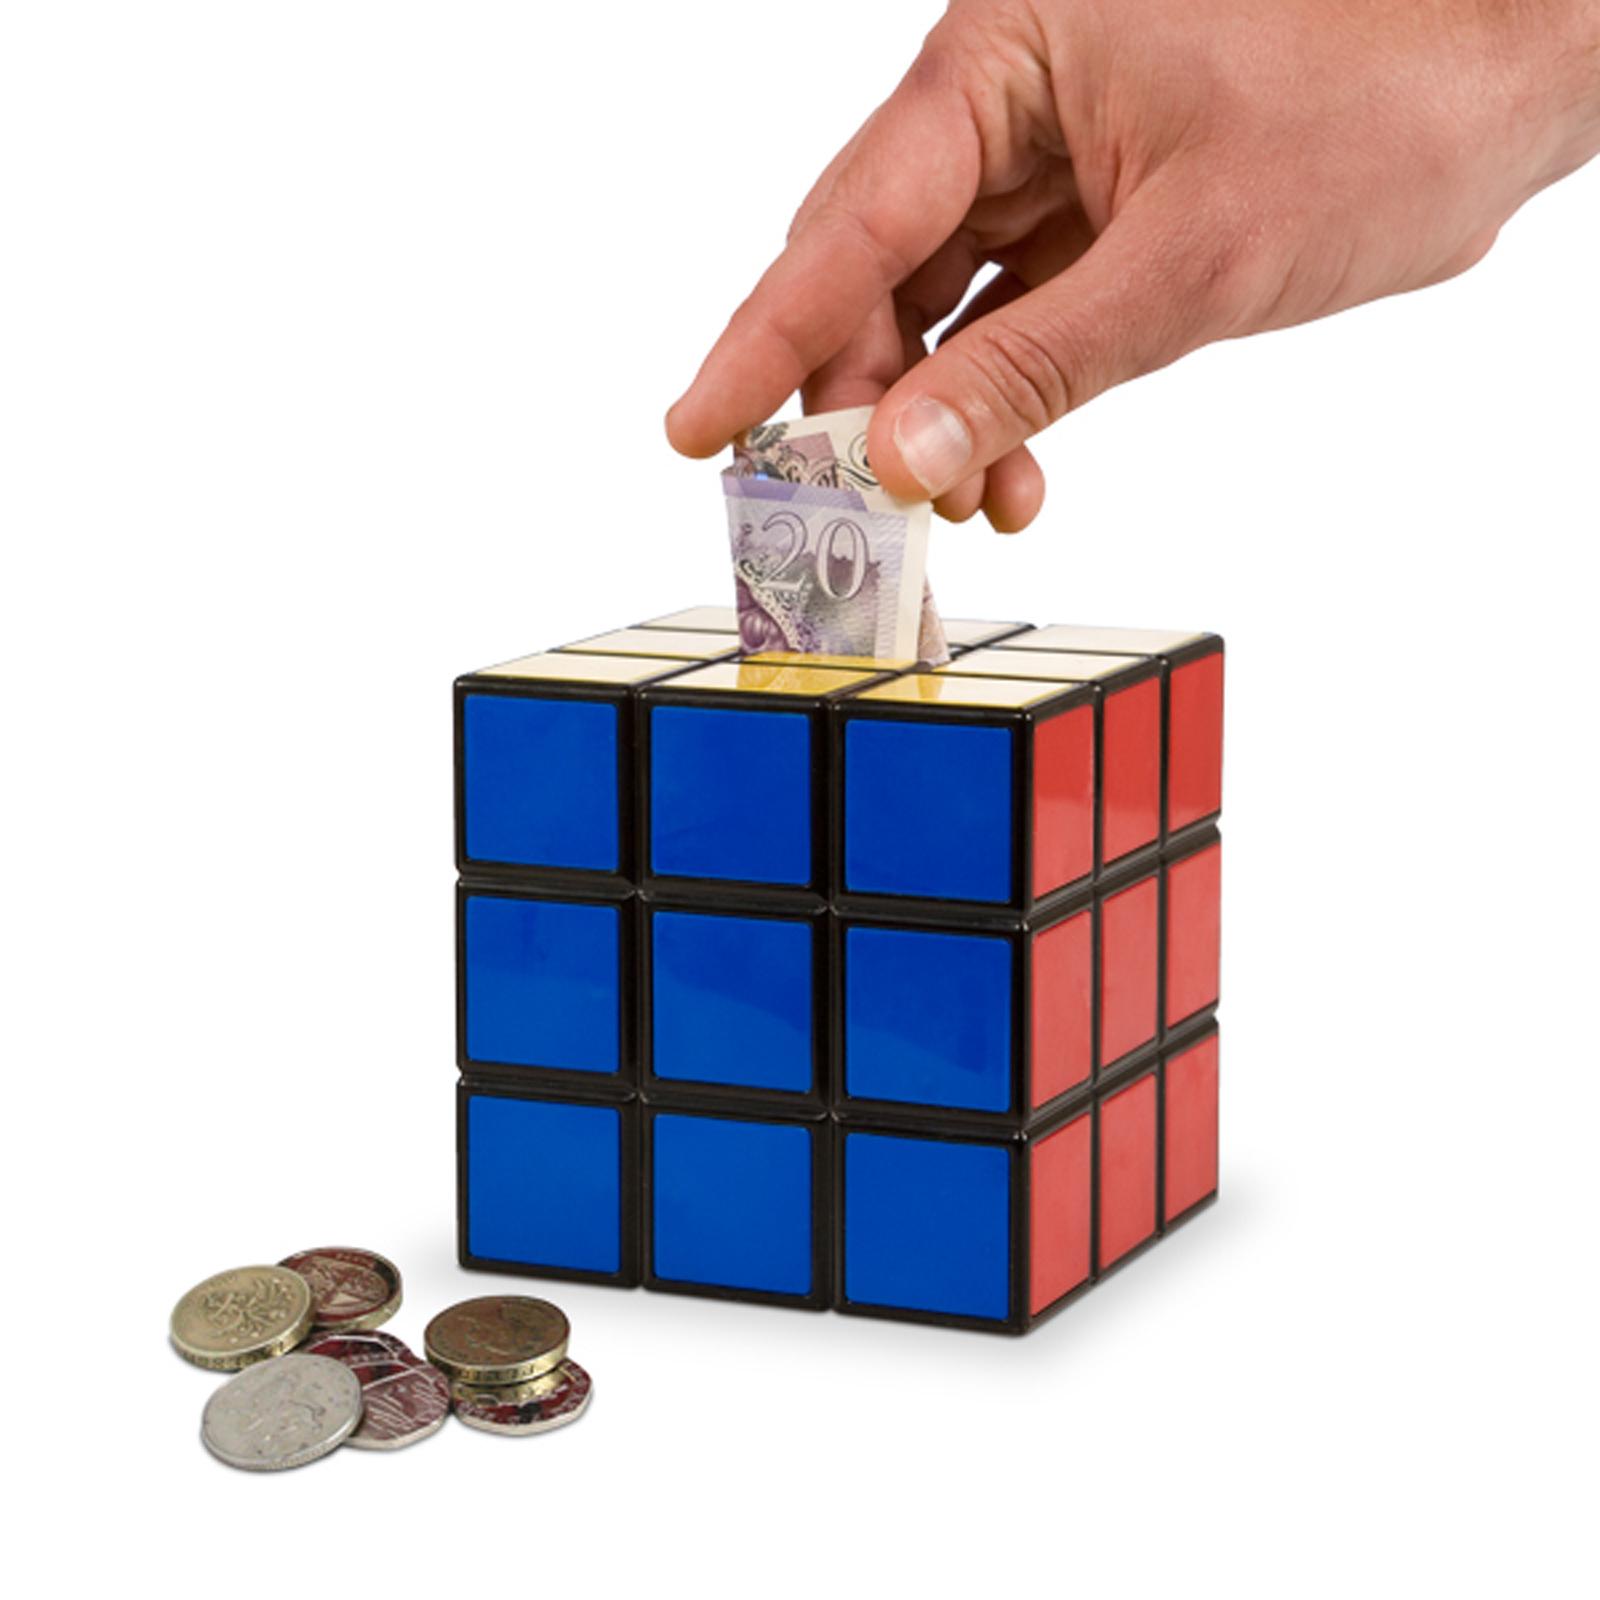 Кубик для денег своими руками